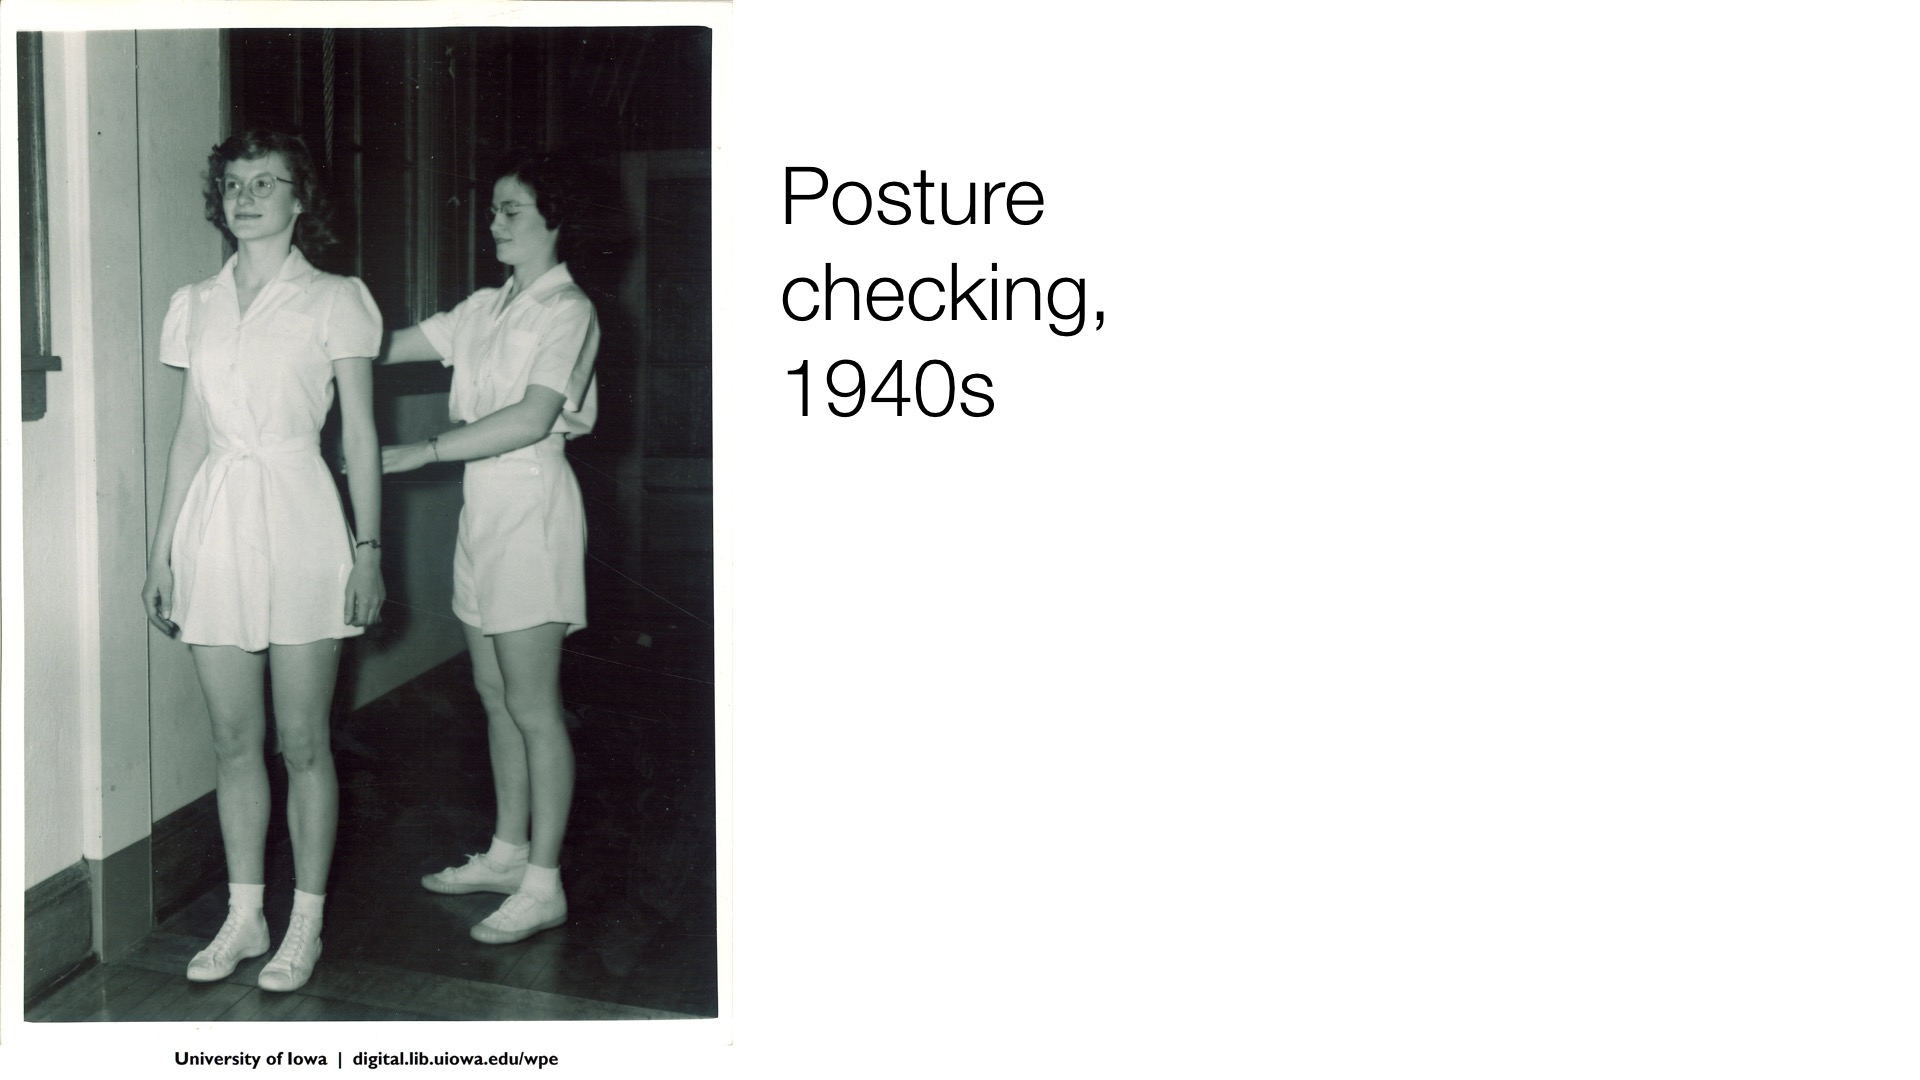 posture checking